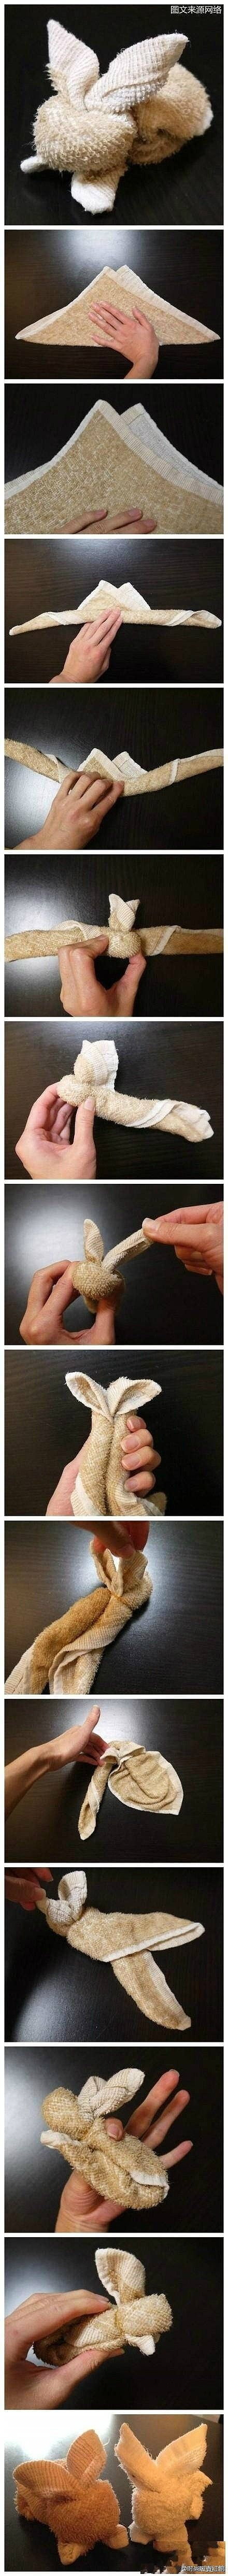 Rabbit towel folding